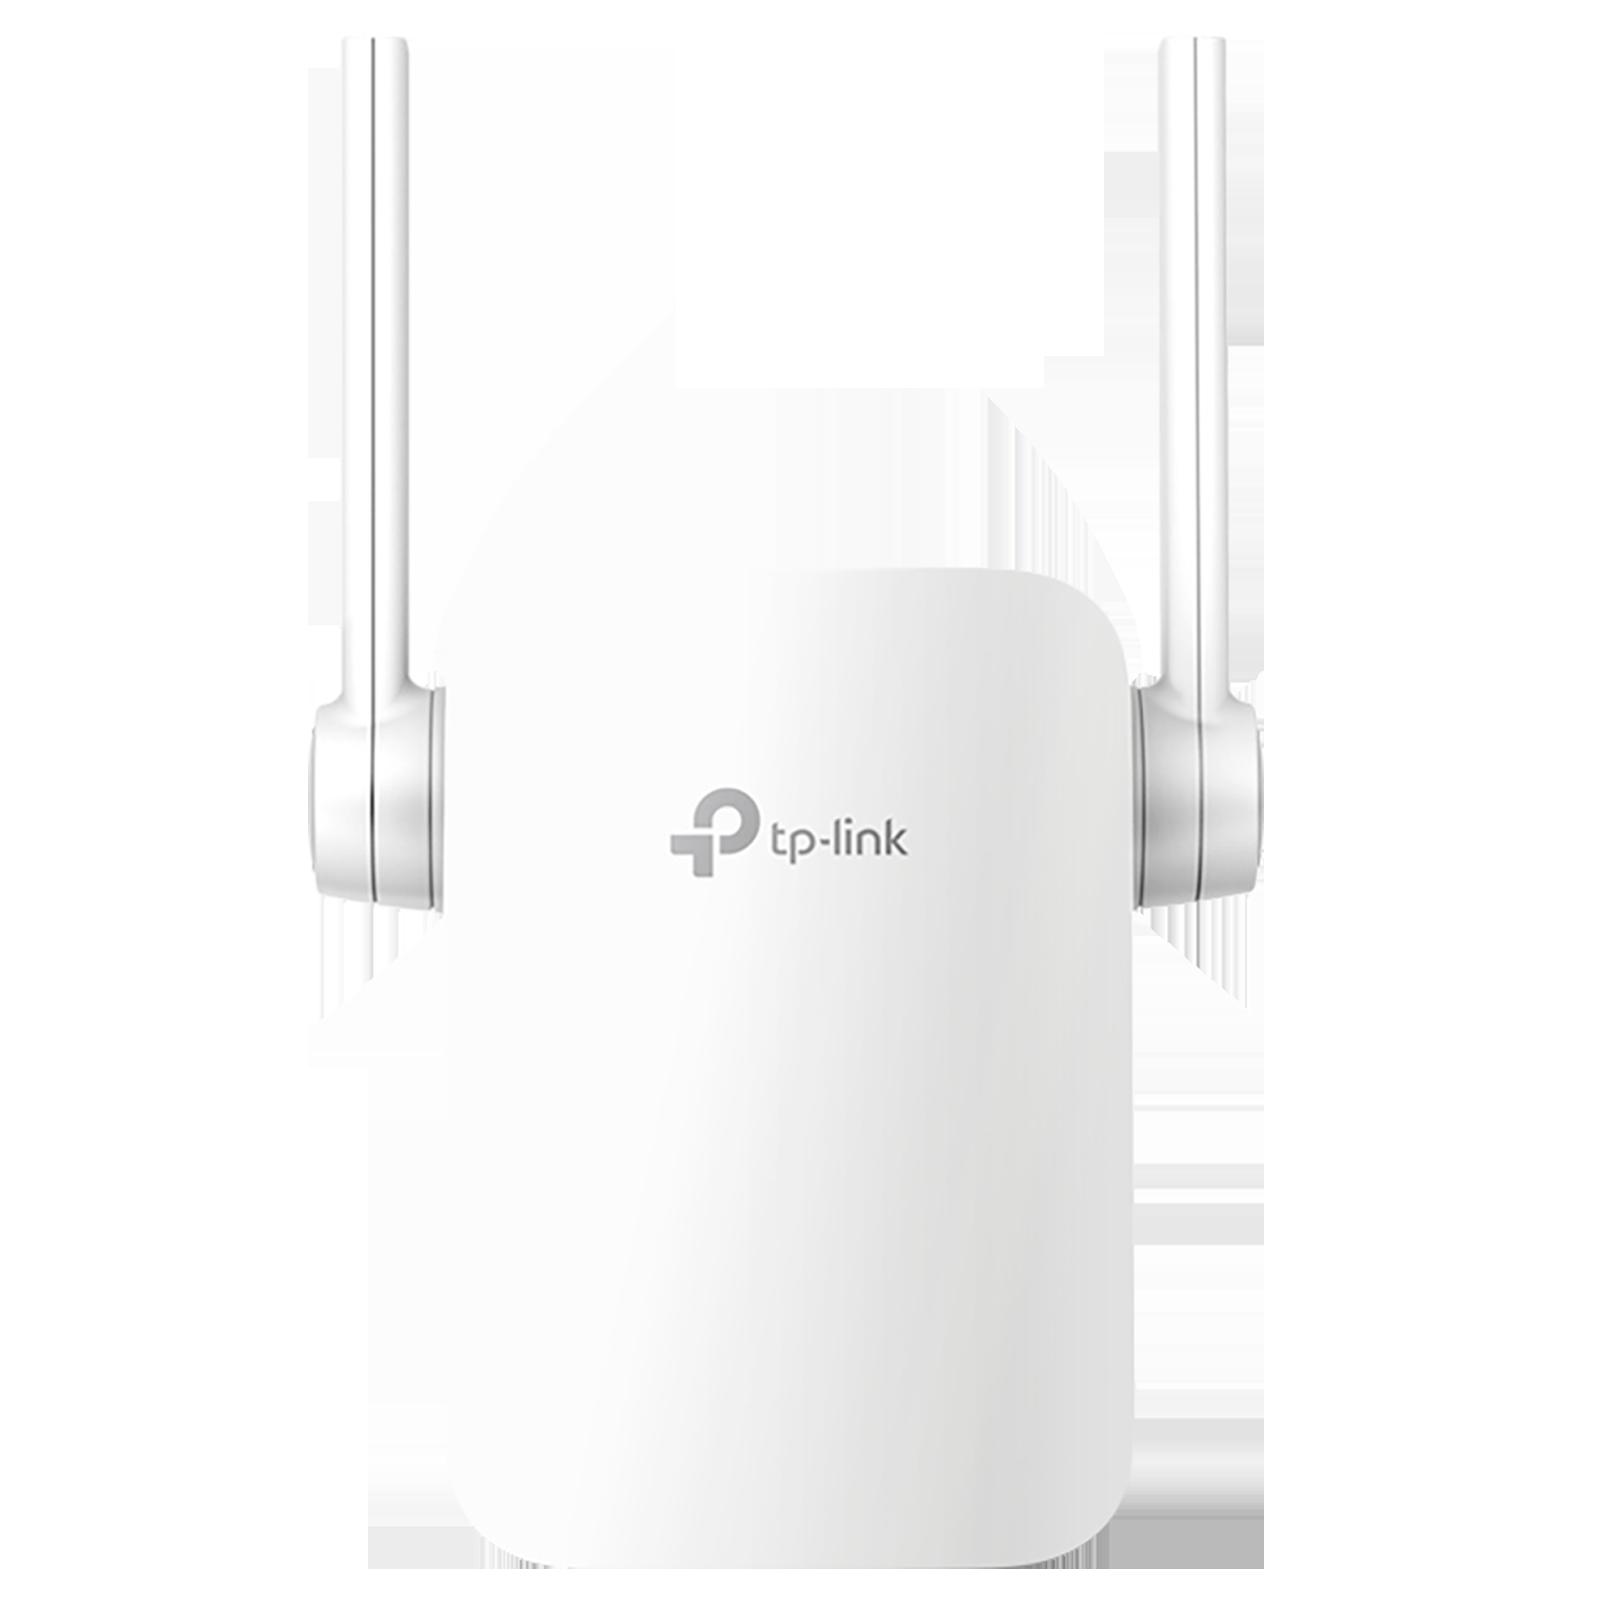 Tp-Link RE205 AC1200 Dual Band Wi-Fi Range Extender (Intelligent Signal Light, 153500512, White)_1